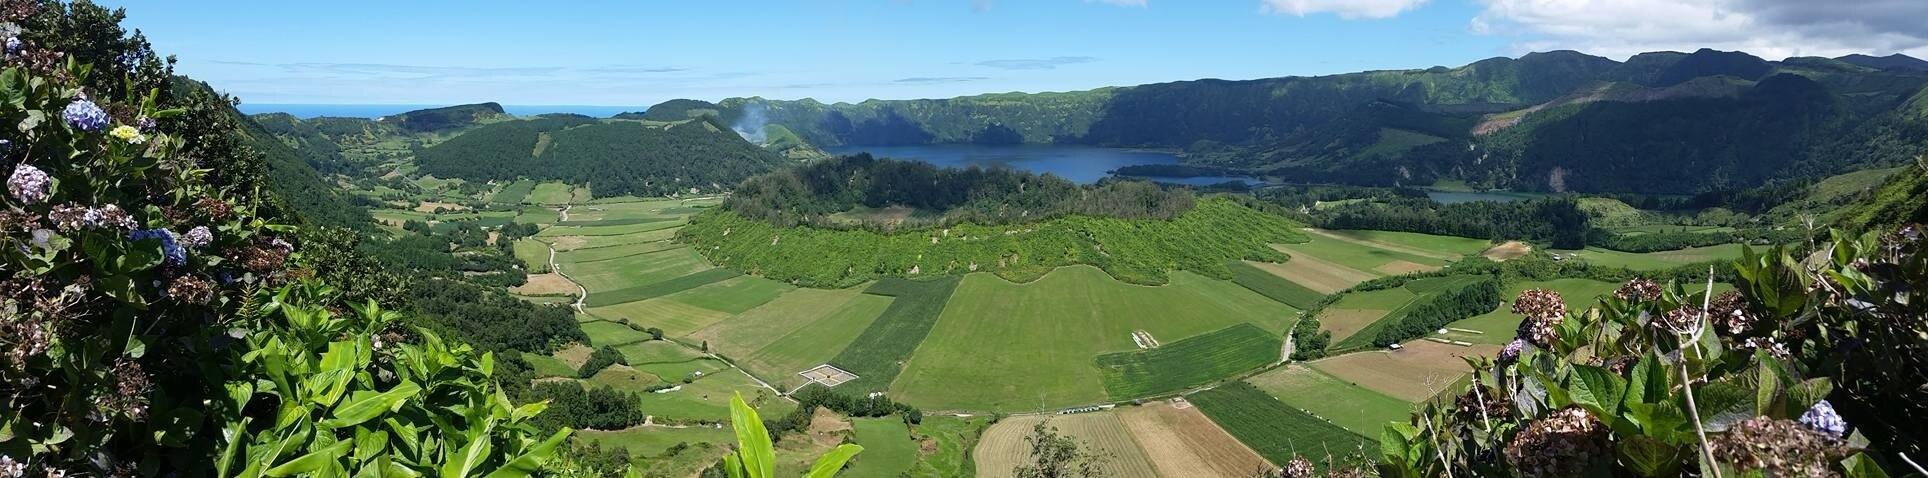 Lagoa de Santiago, Ponta Delgada, Azores, Portugal